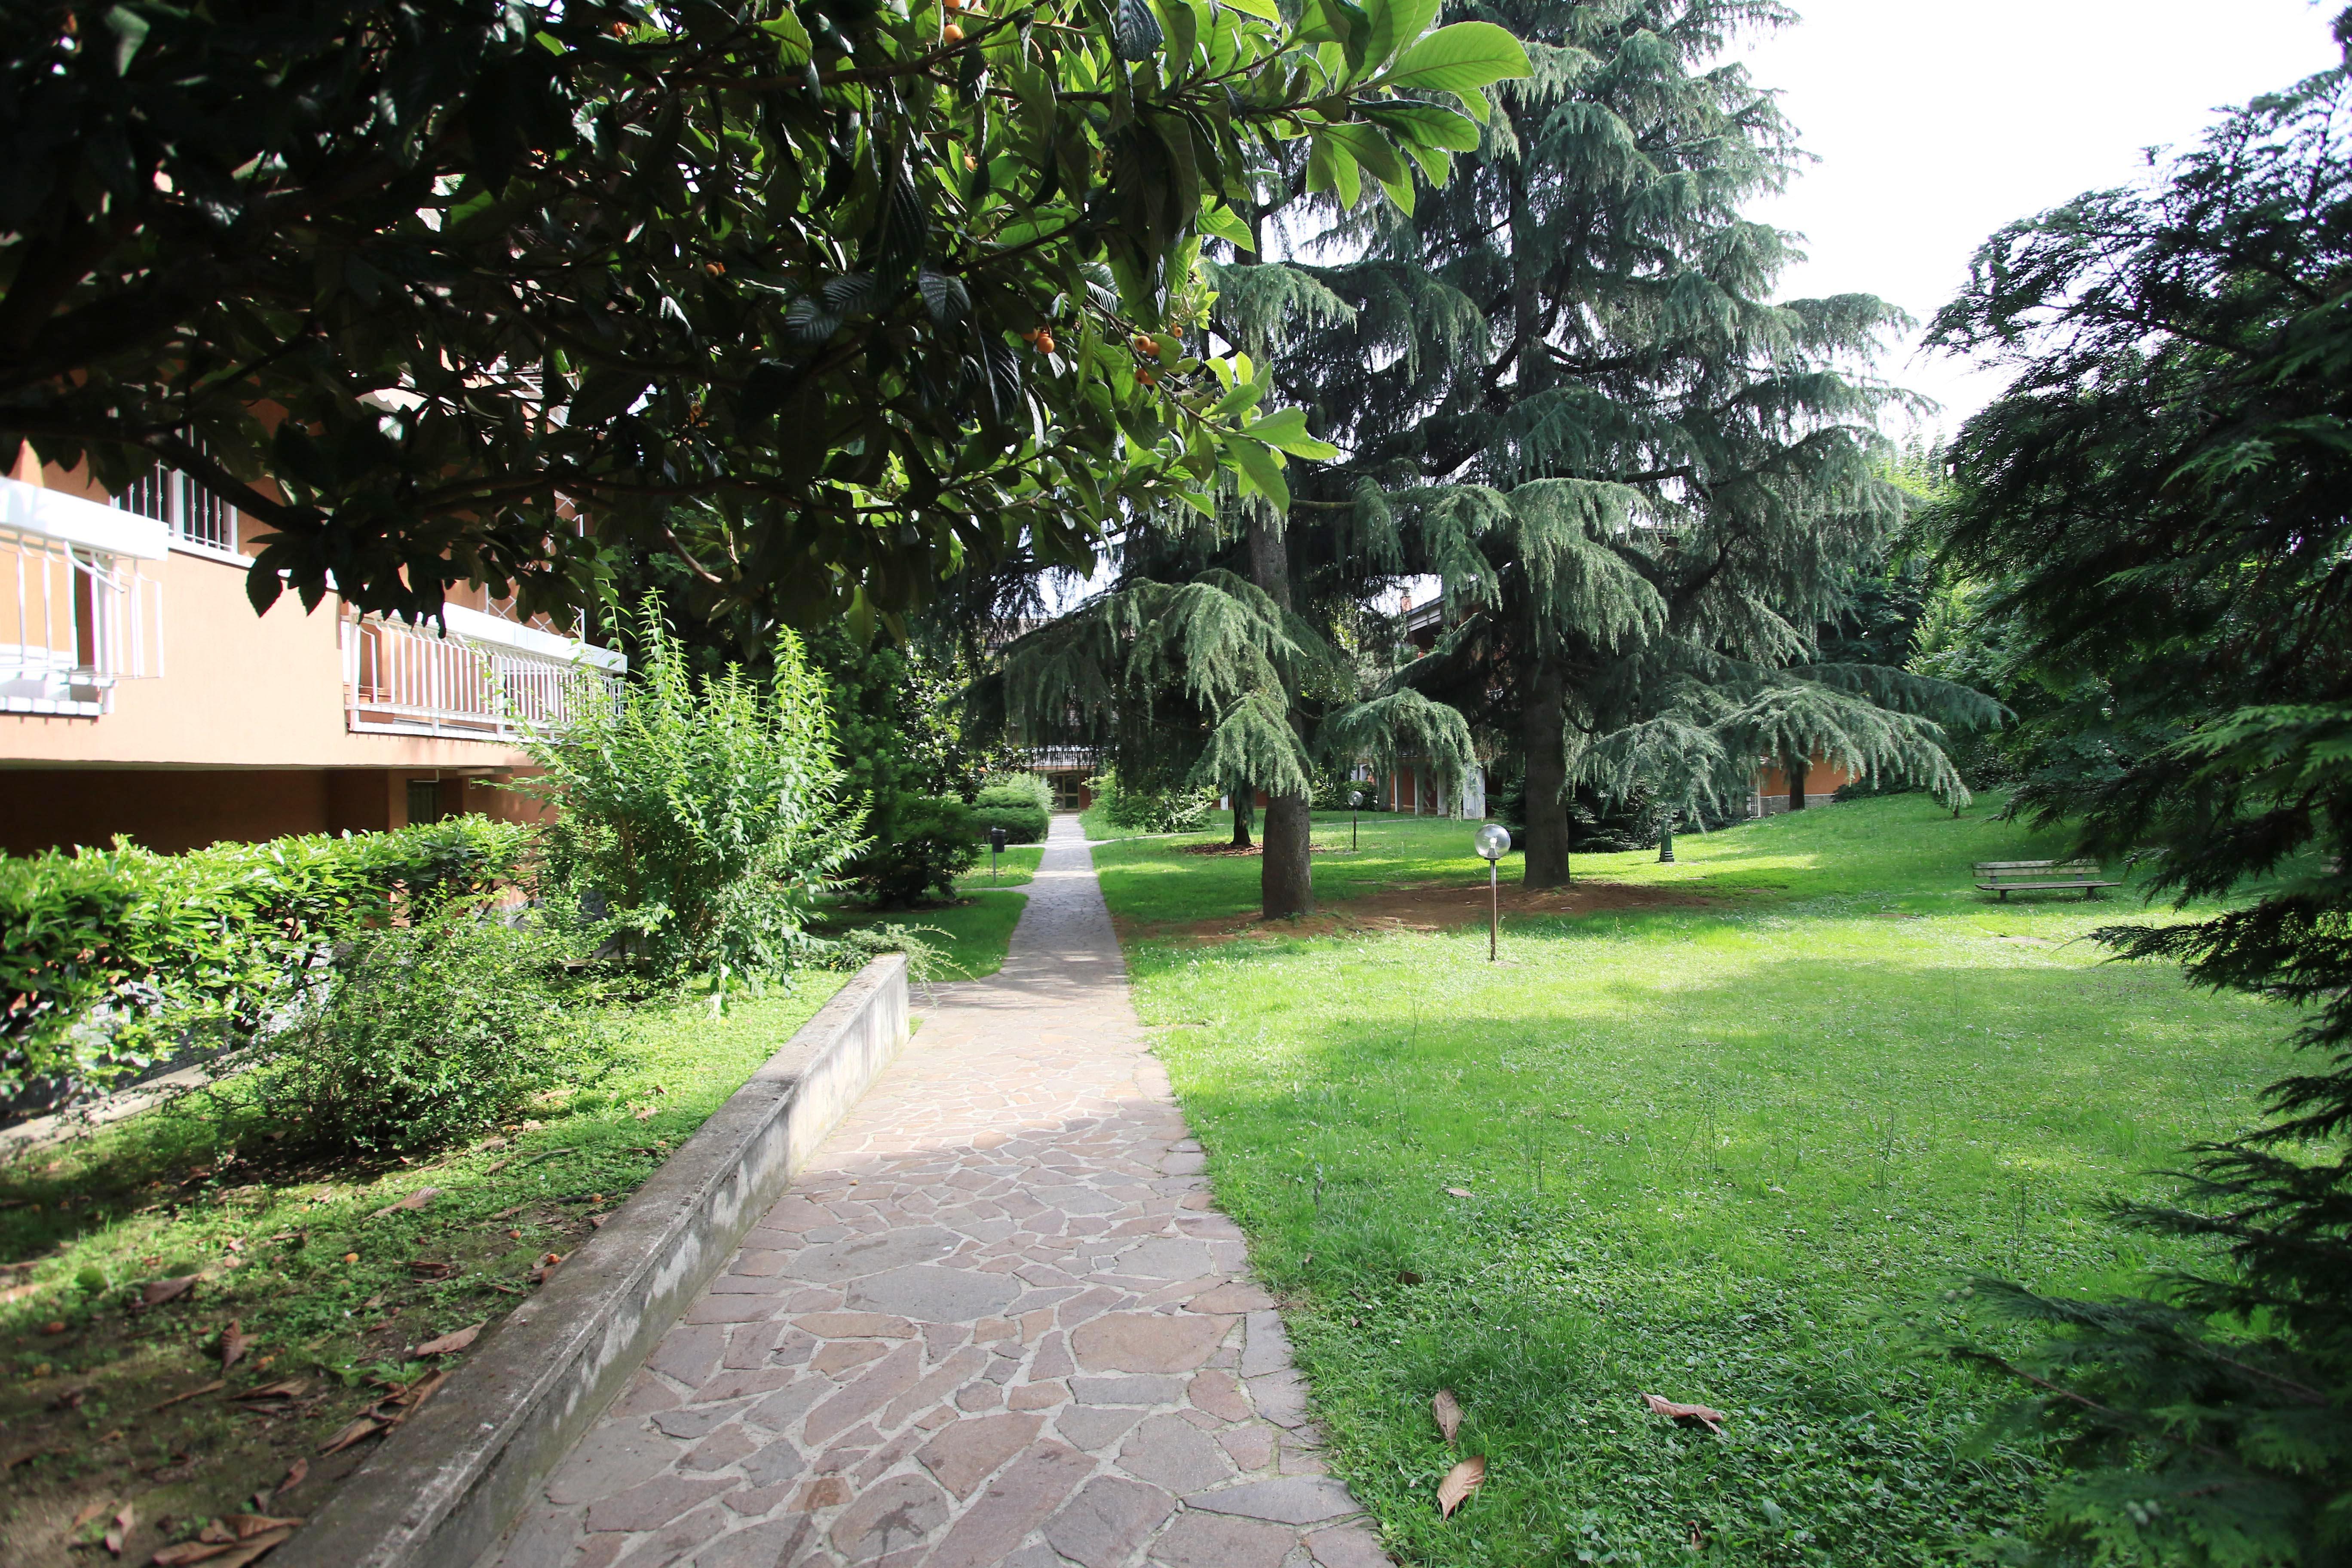 14 giardino condominiale 004 l 39 idea group - Giardino condominiale ...